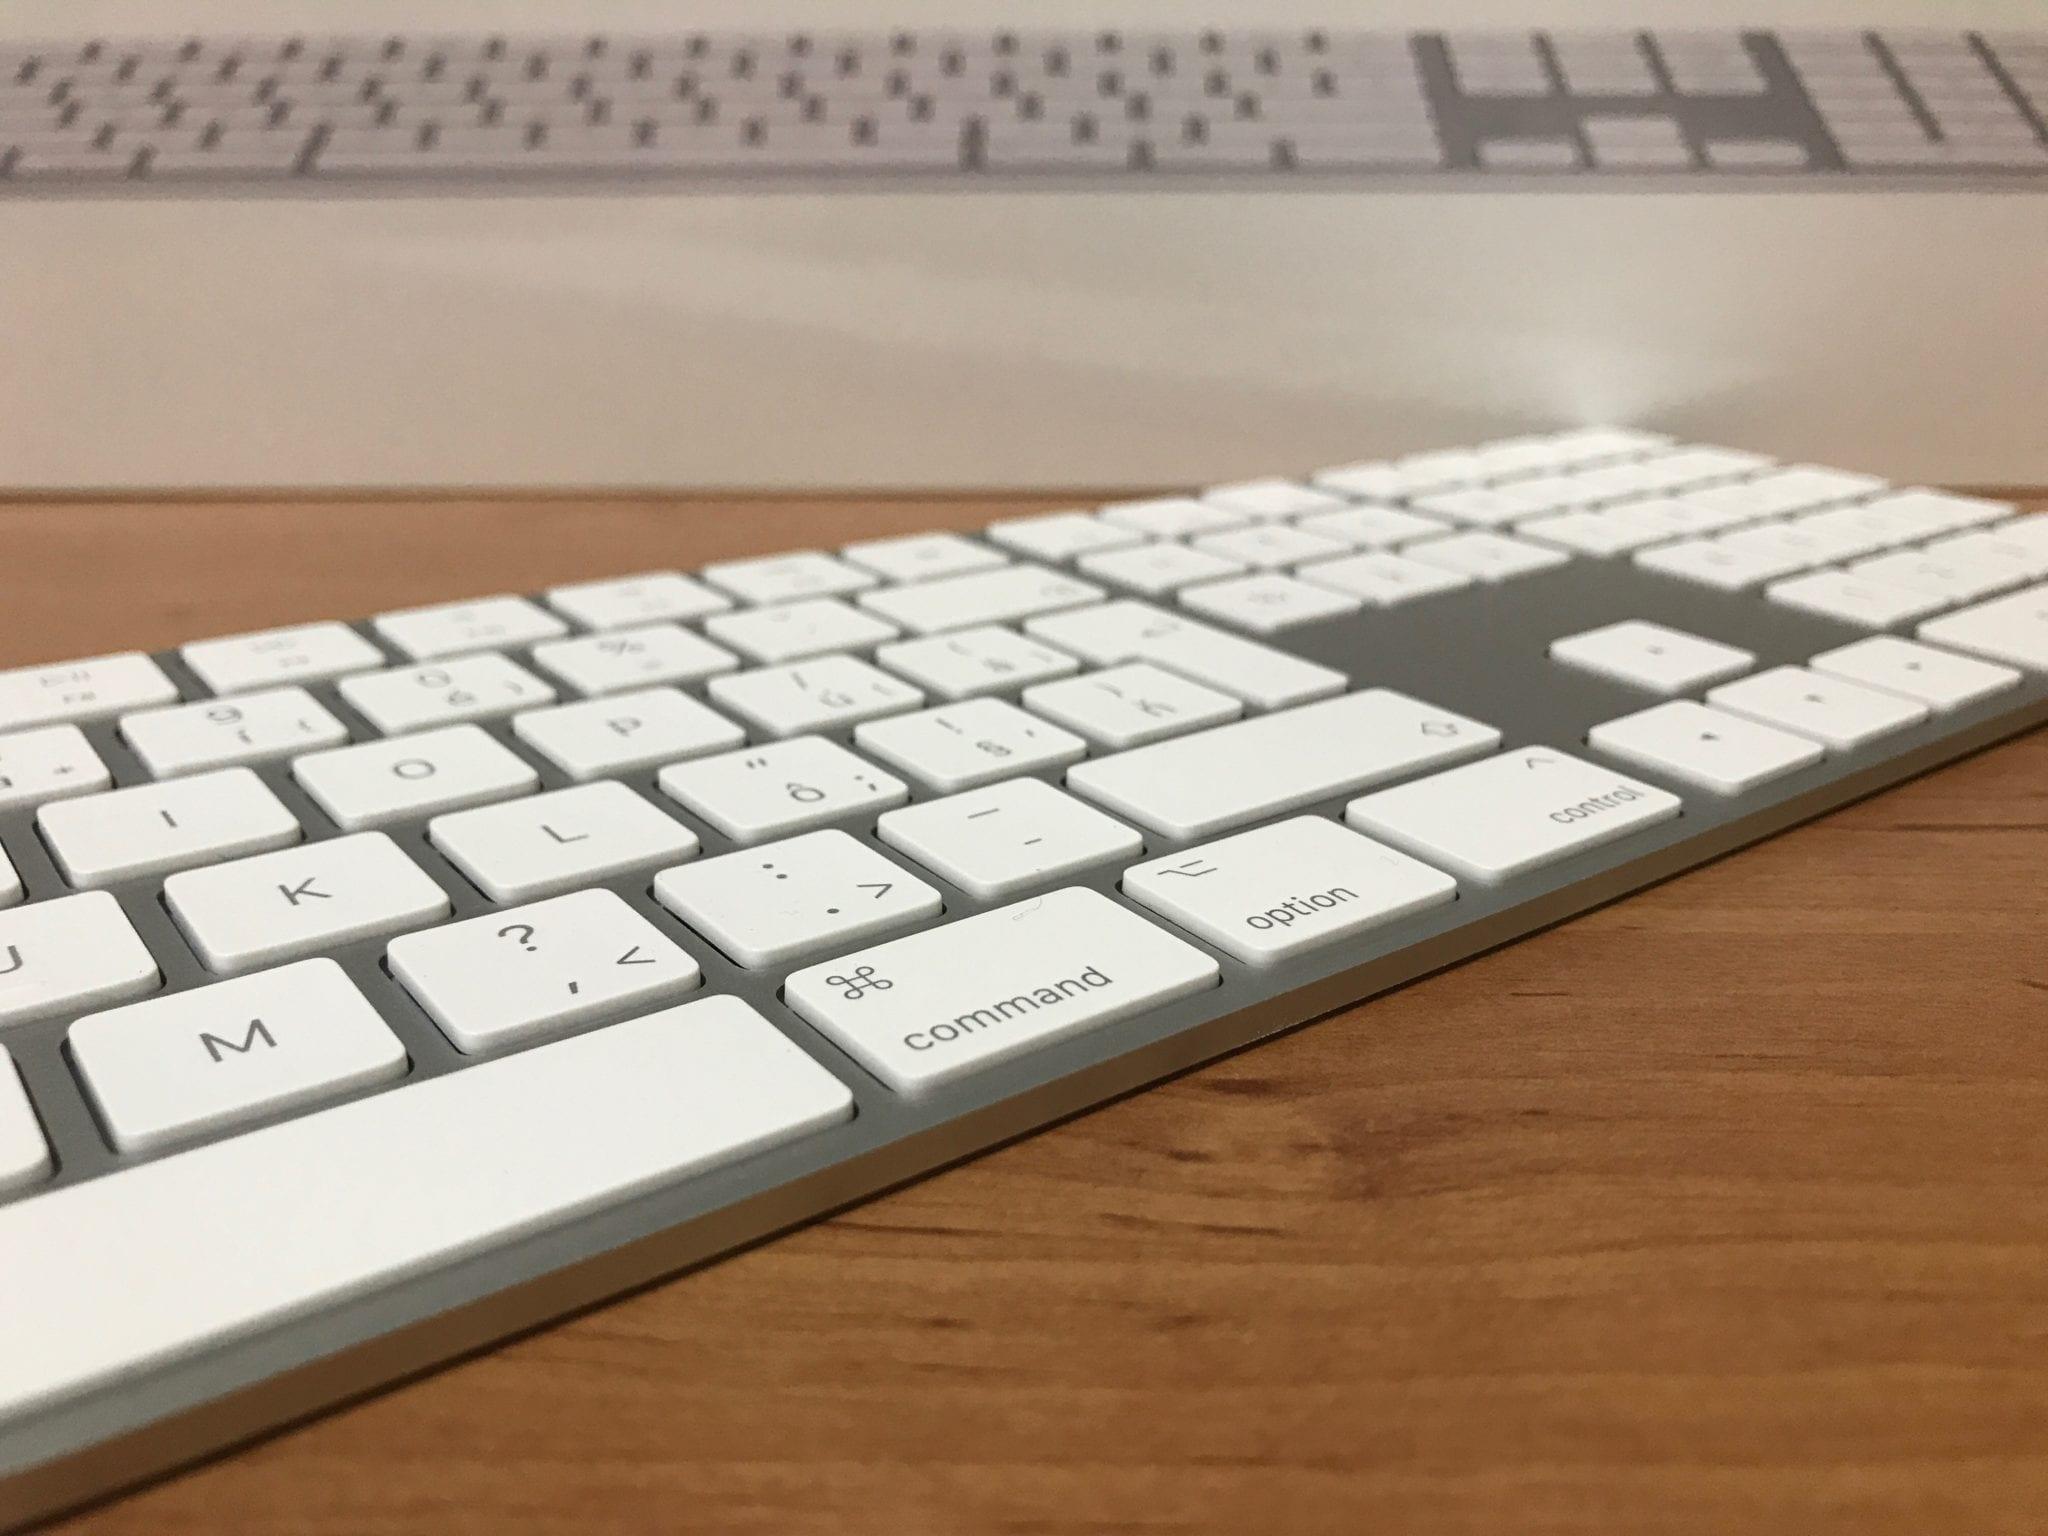 IMG 1700 - Recenzia: Magic Keyboard s numerickými klávesami